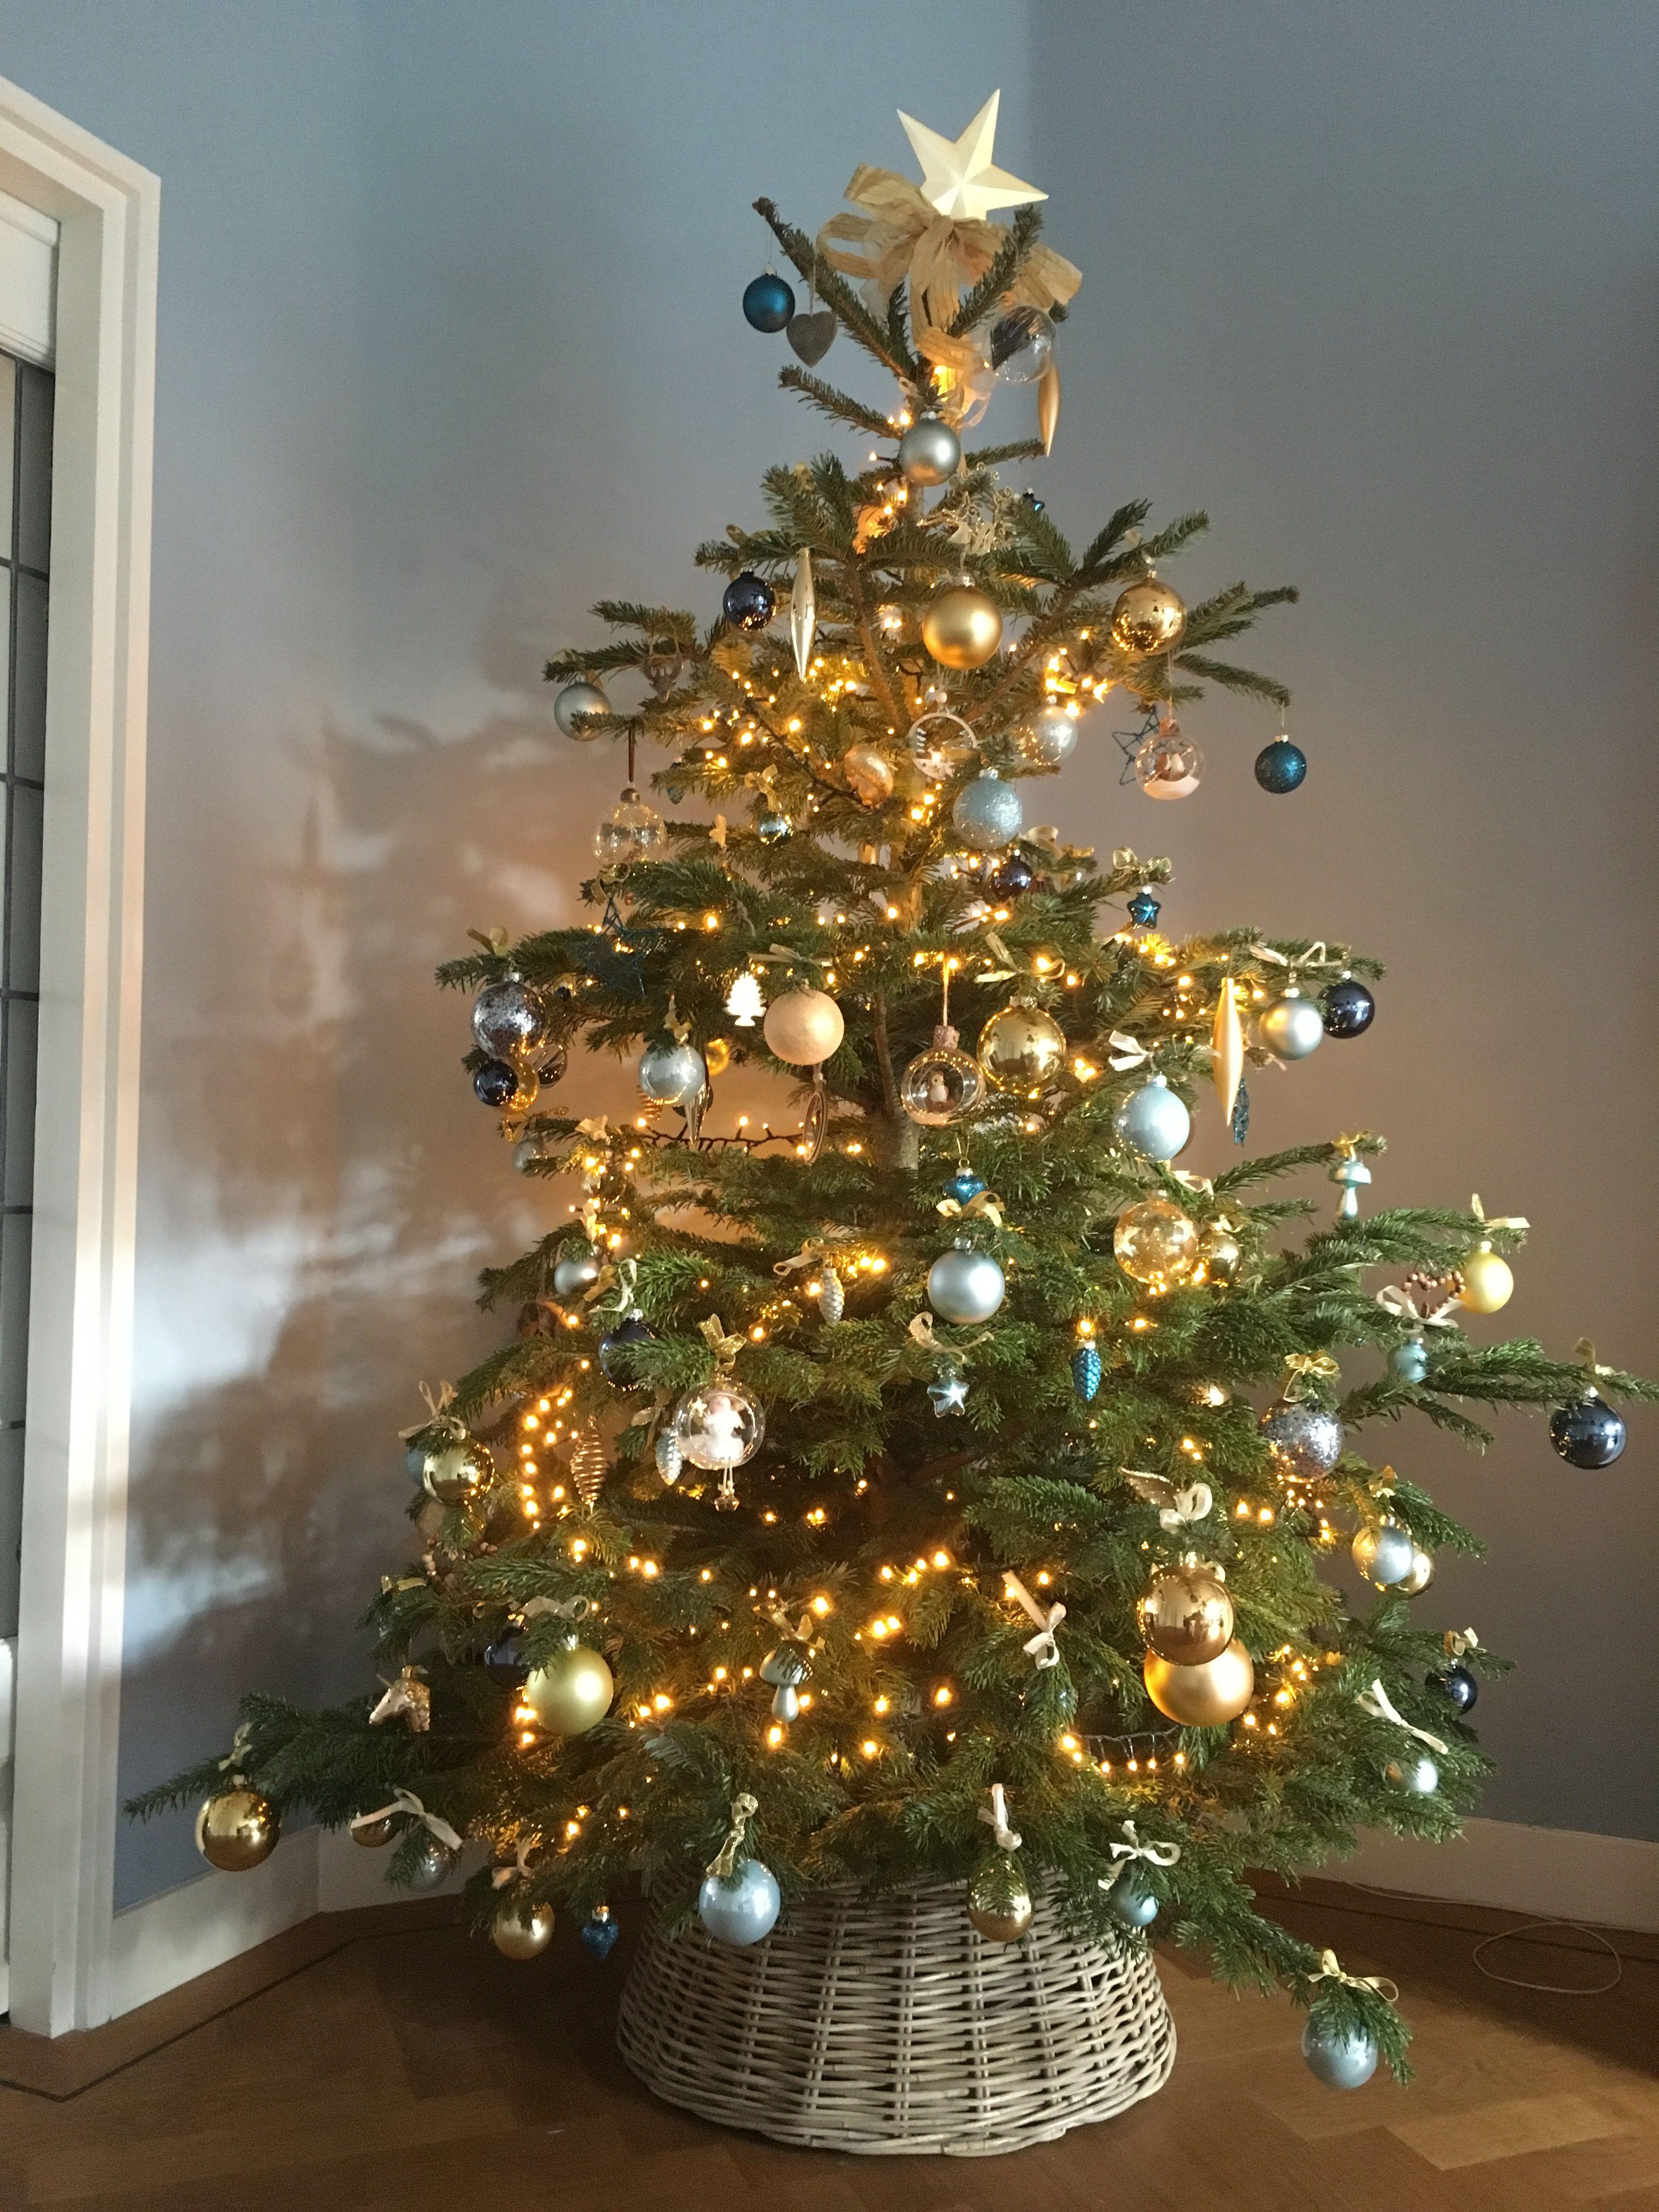 Kerstboom Blauw Goud Kerstboom Blauw Goud Kerstversiering